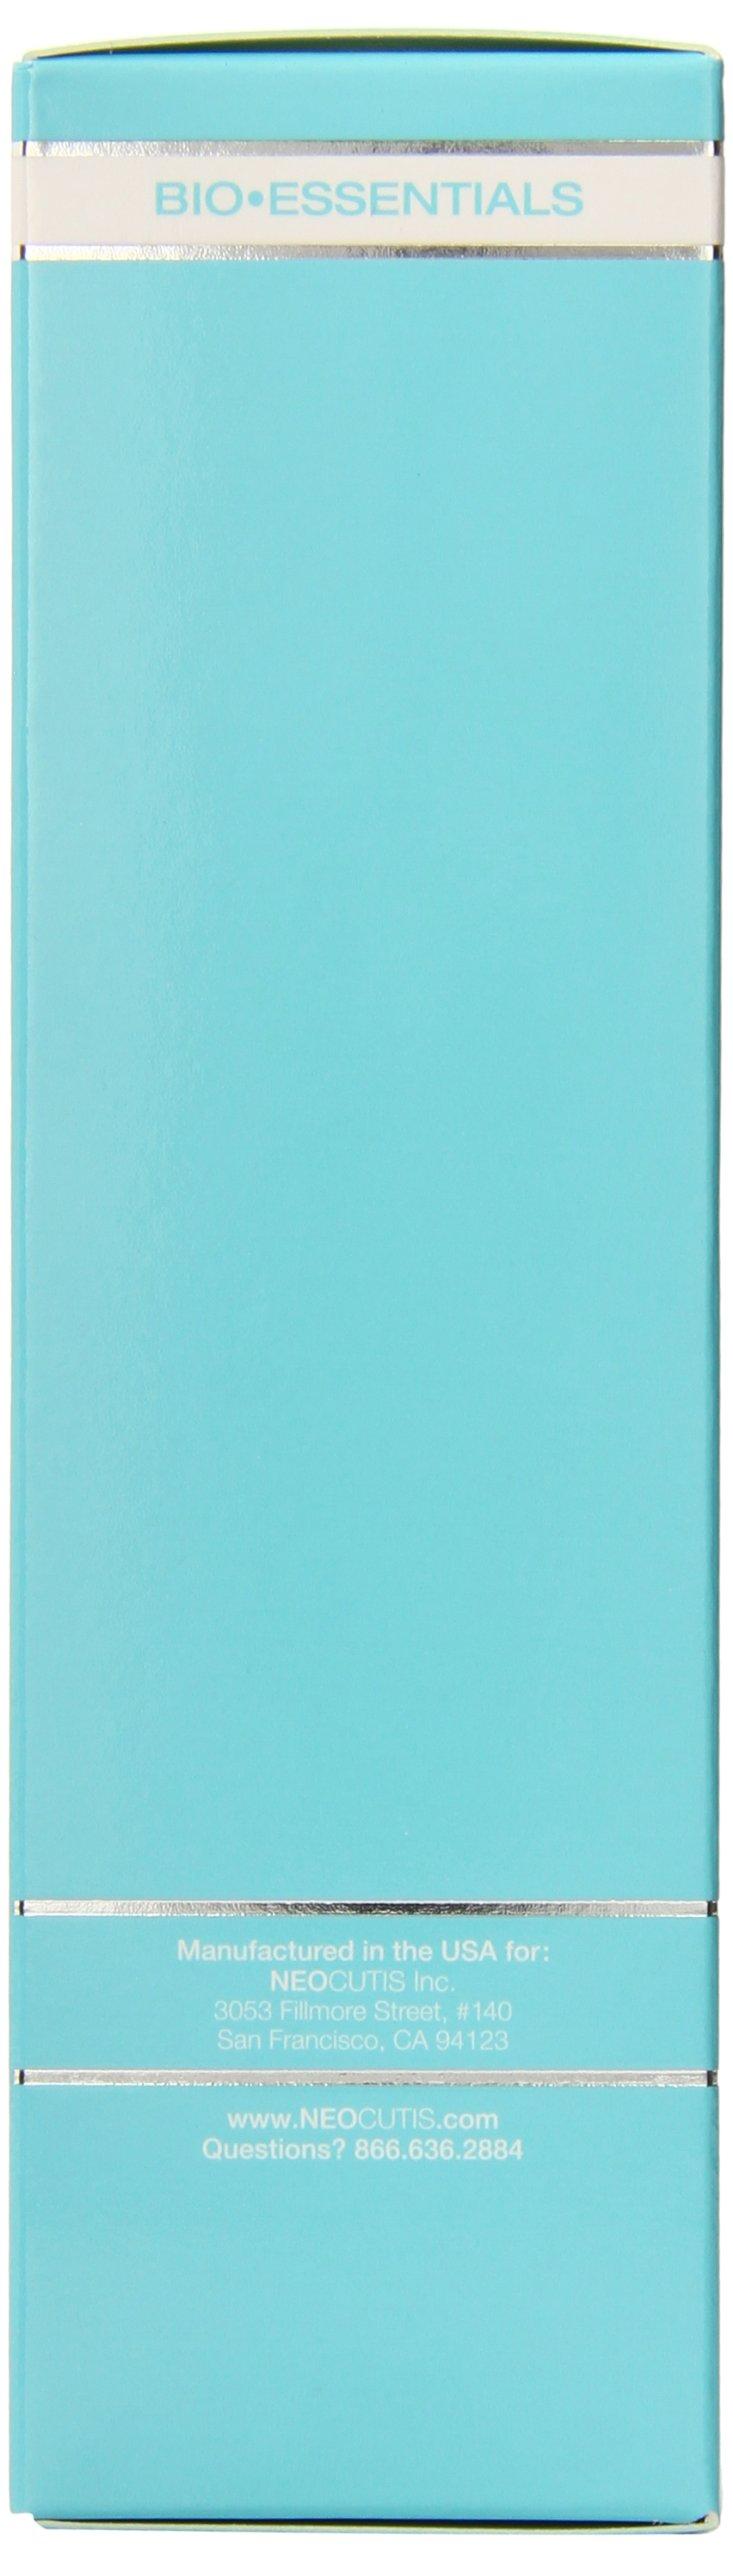 NEOCUTIS Bio-Cream Bio-restorative Skin Cream with PSP, 1.69 Fl Oz by NEOCUTIS (Image #7)